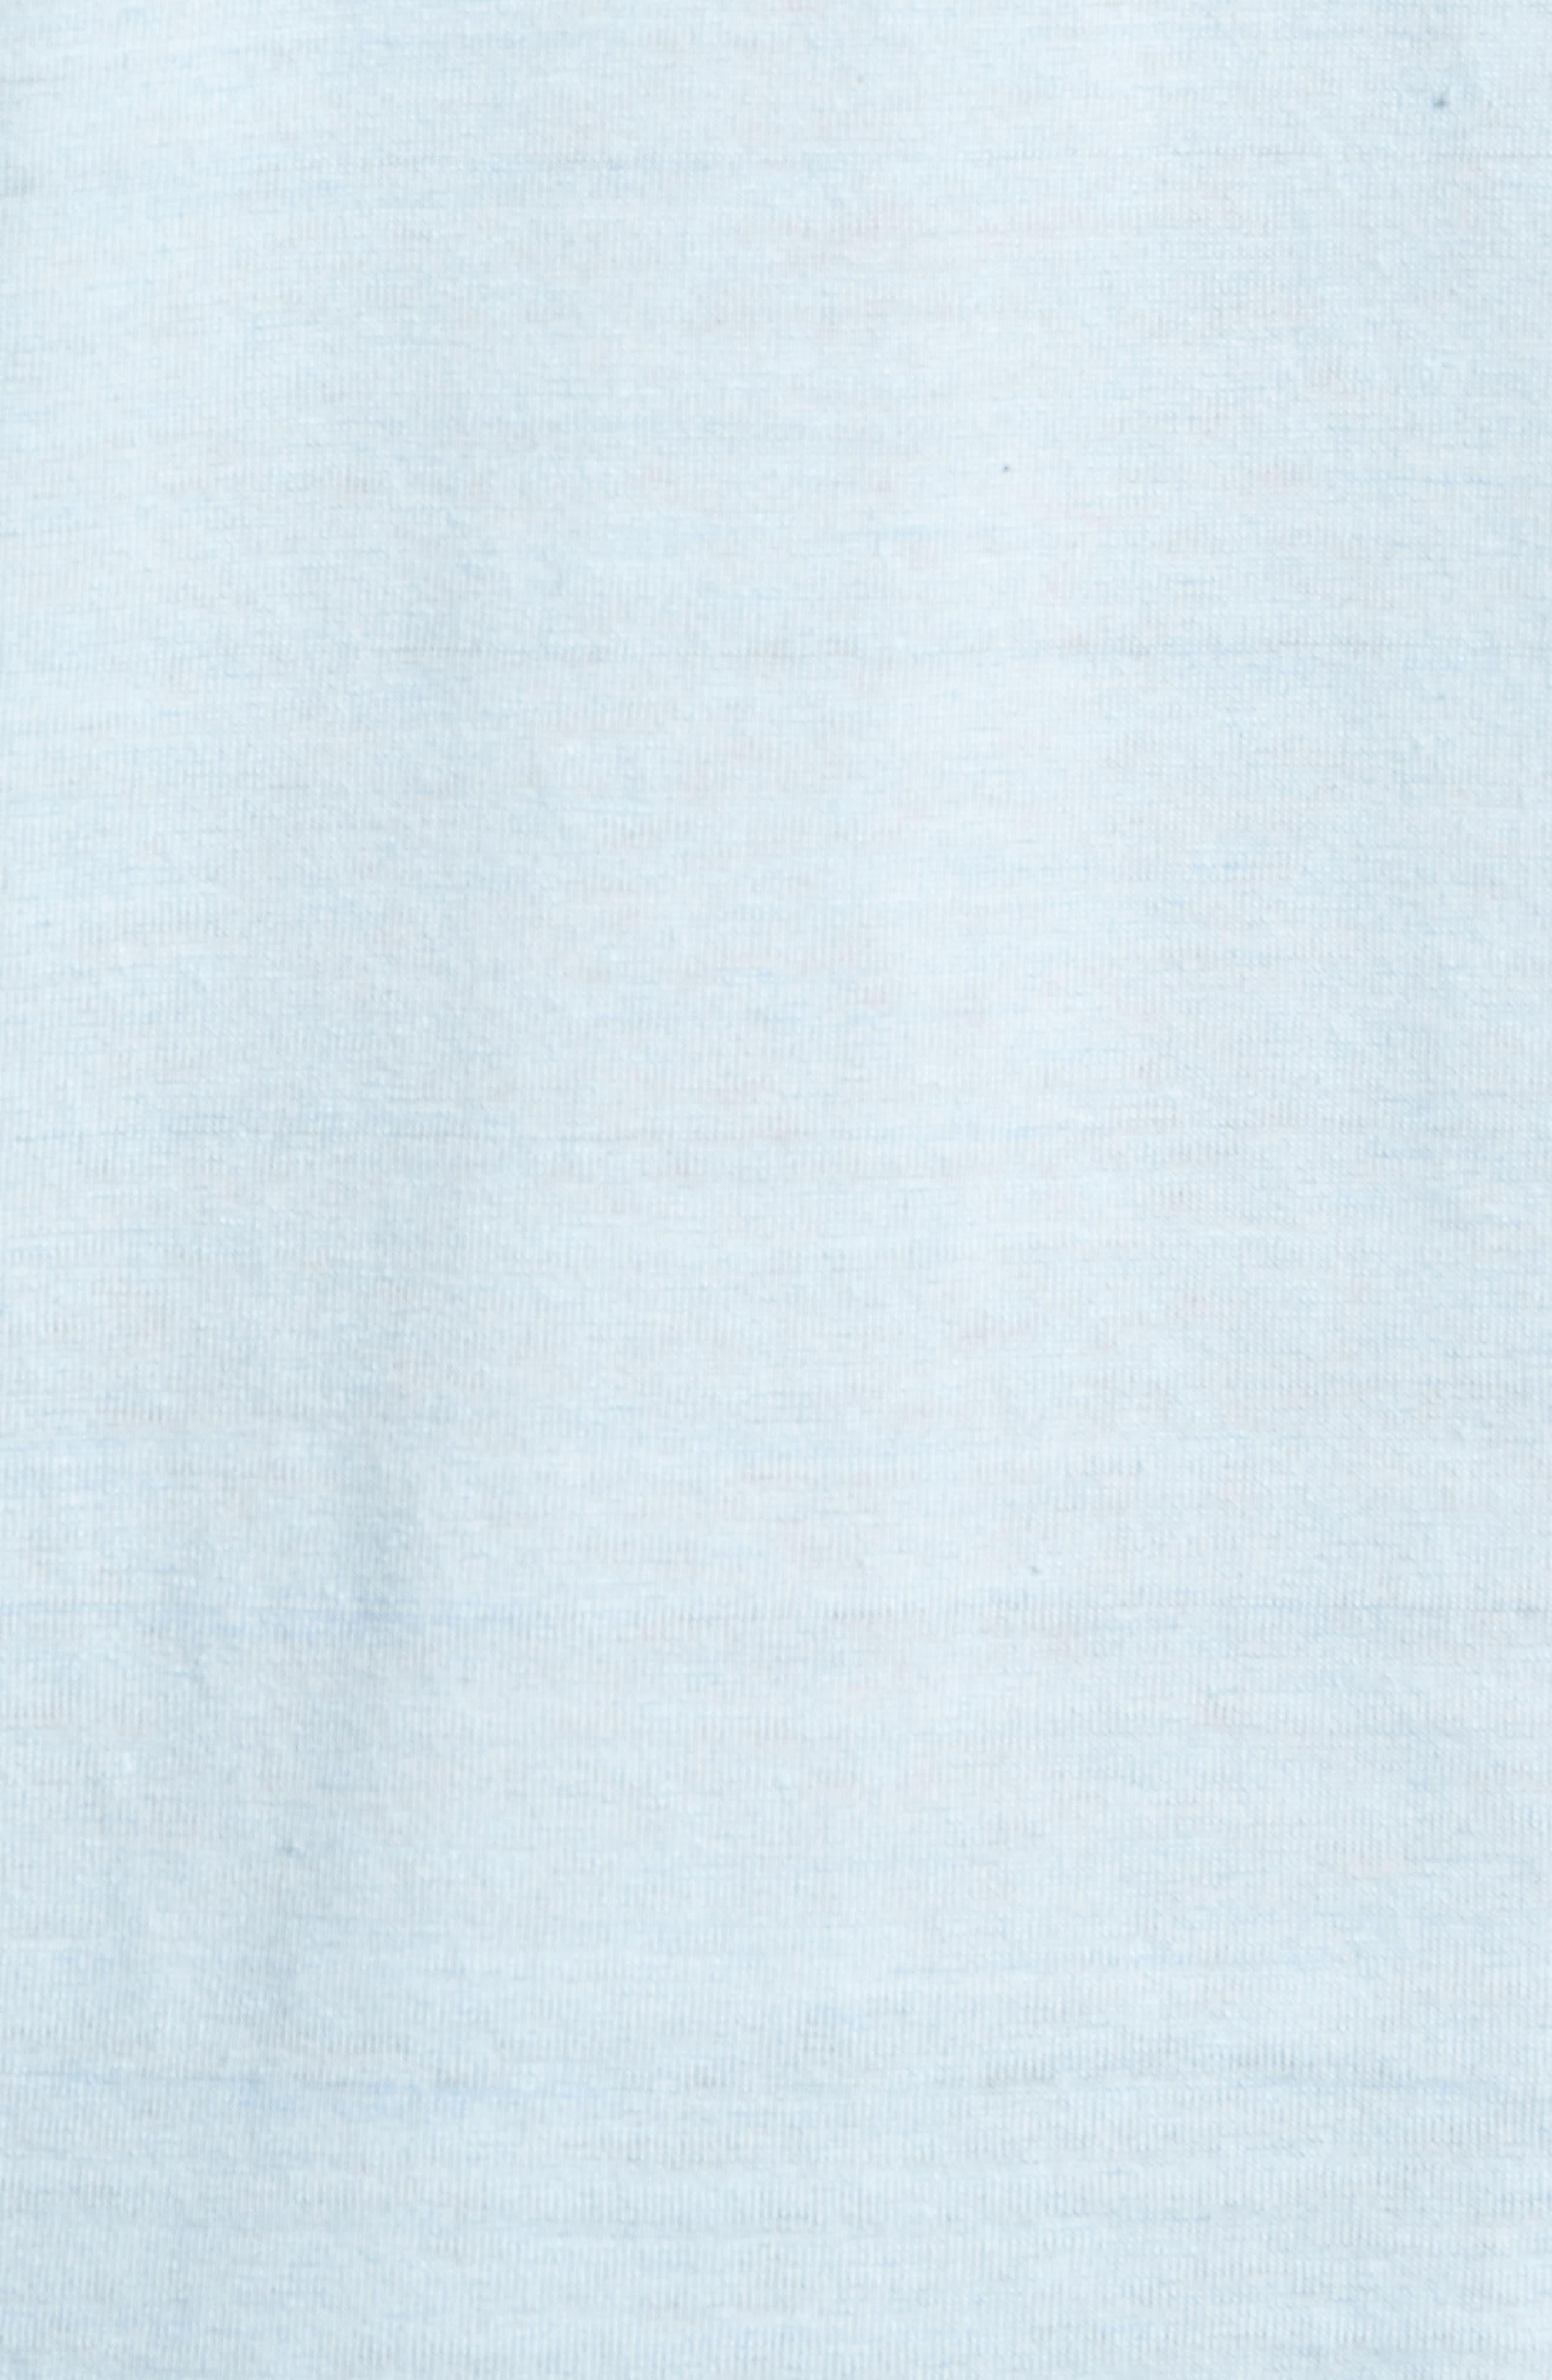 Timber Bay Linen Blend Polo,                             Alternate thumbnail 5, color,                             020